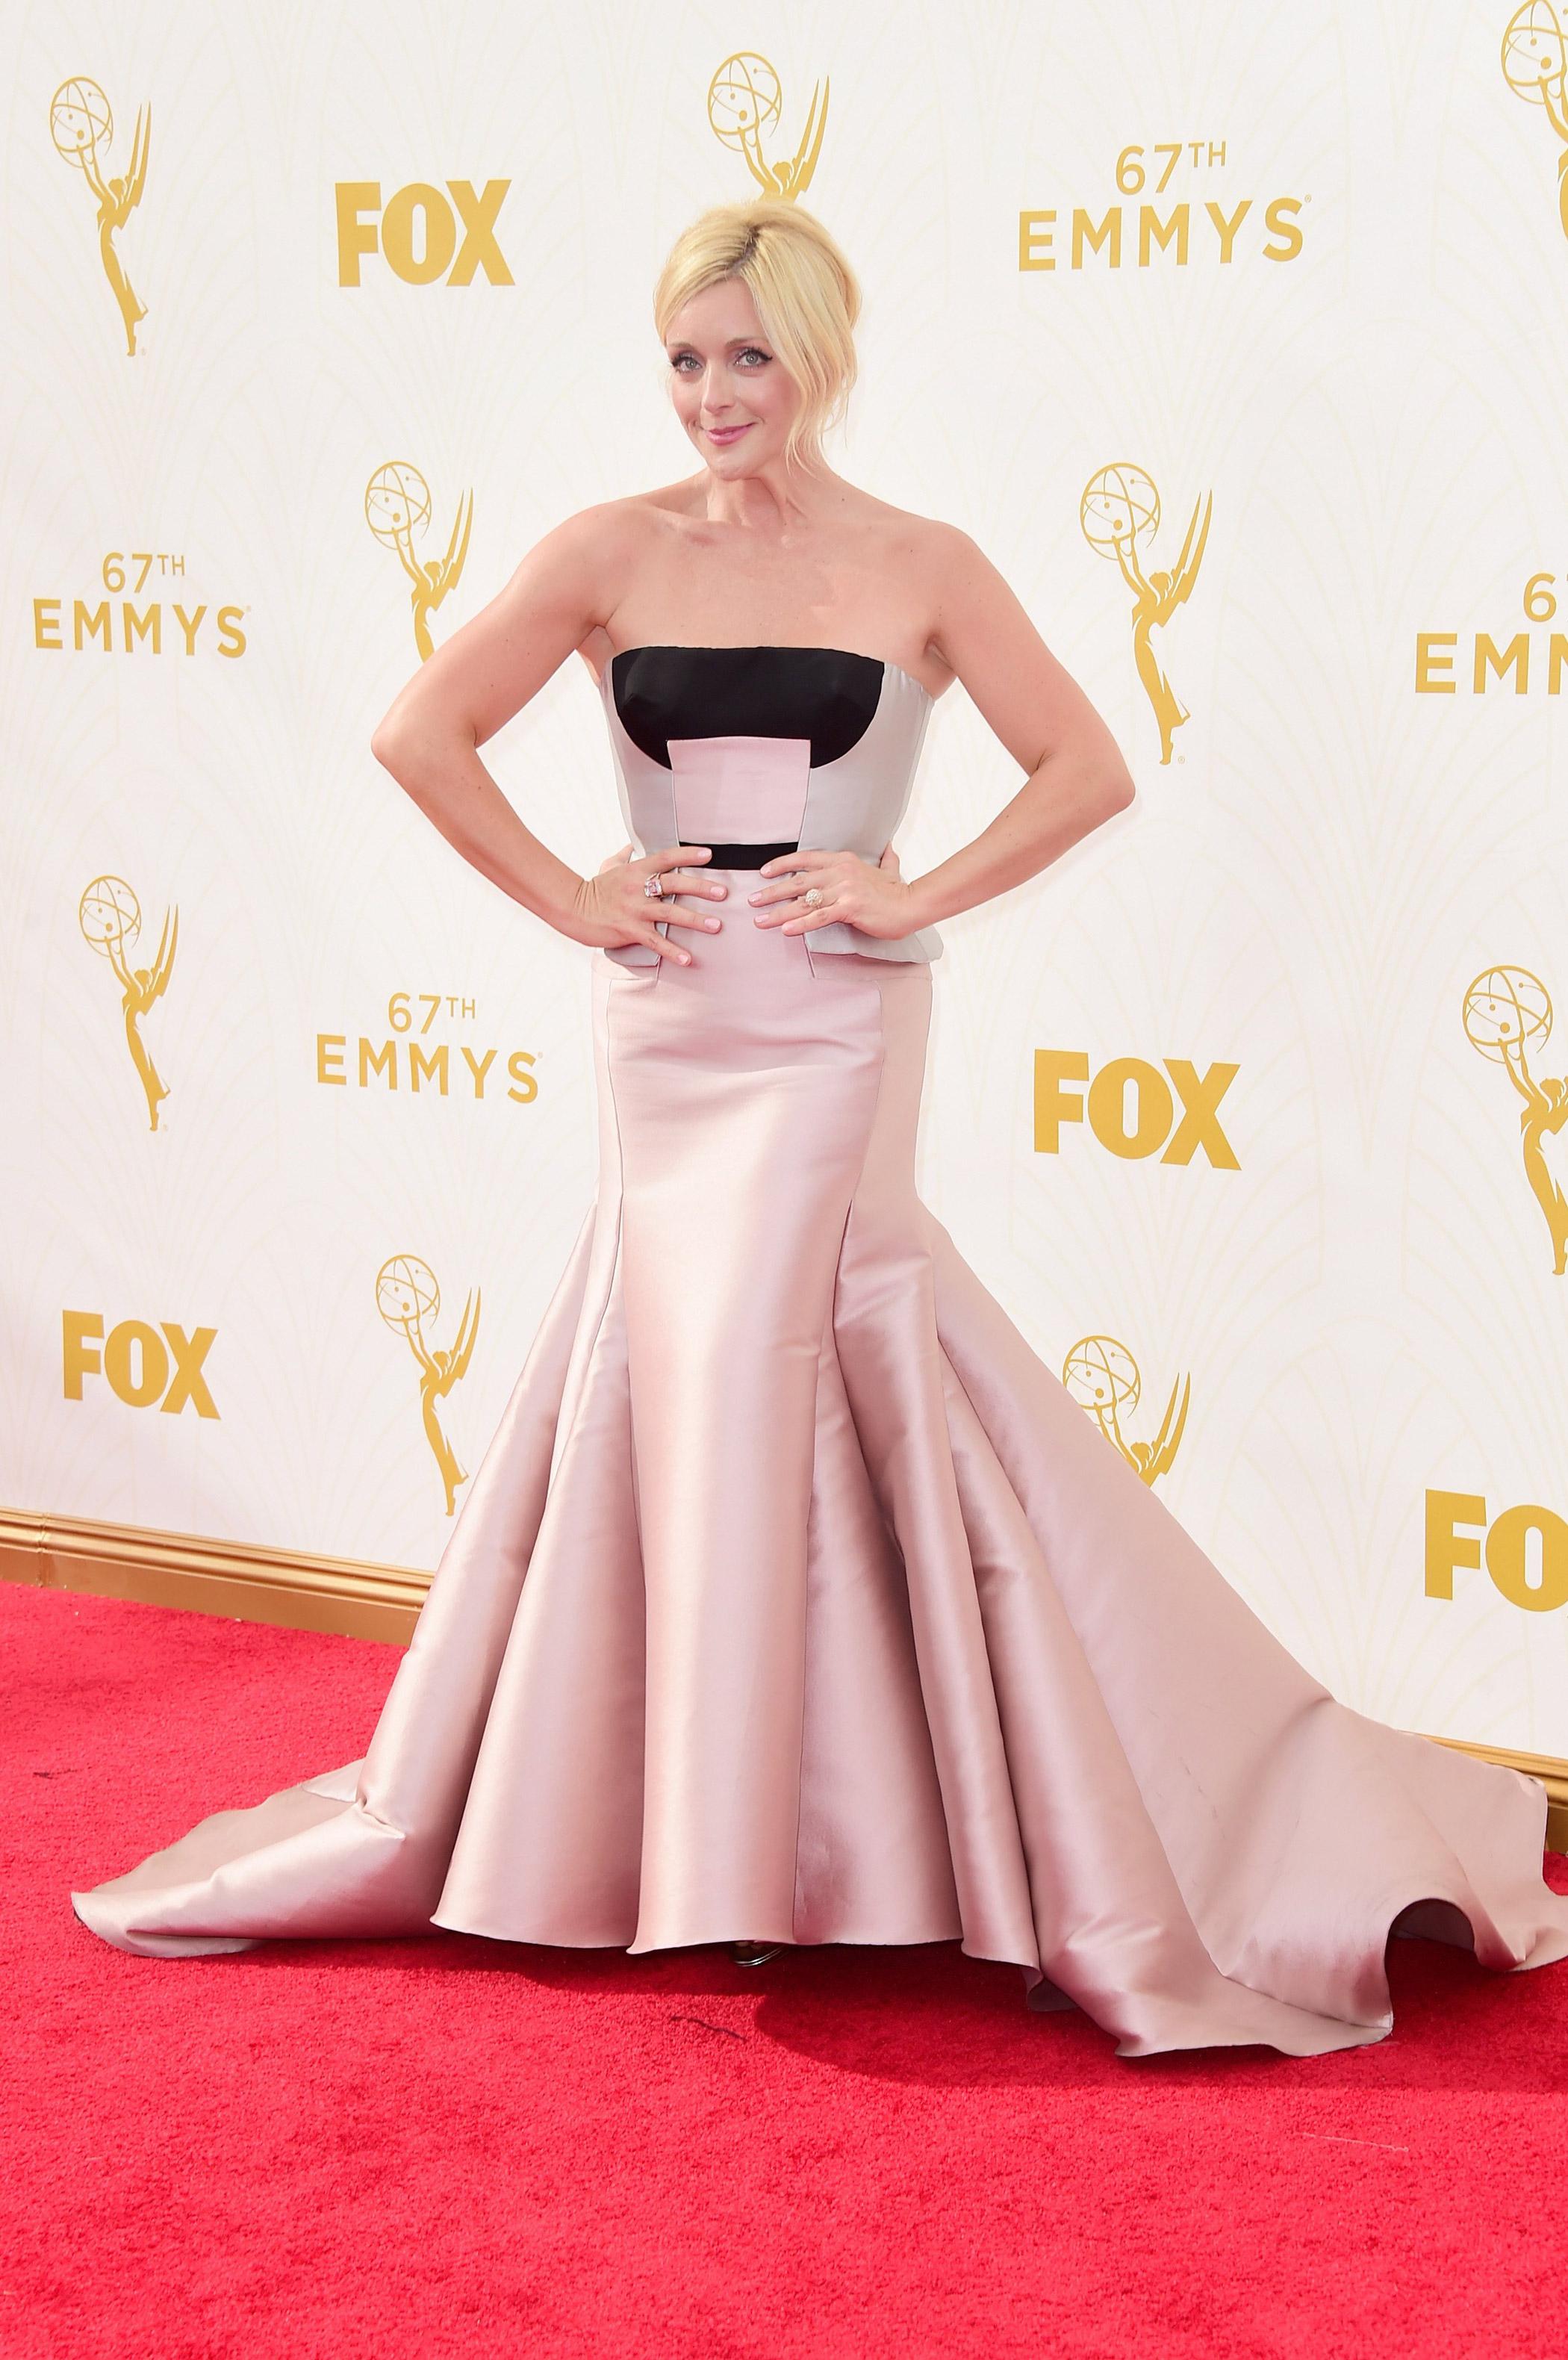 Jane Krakowski at the 67th Emmy Award on Sept. 20, 2015 in Los Angeles.